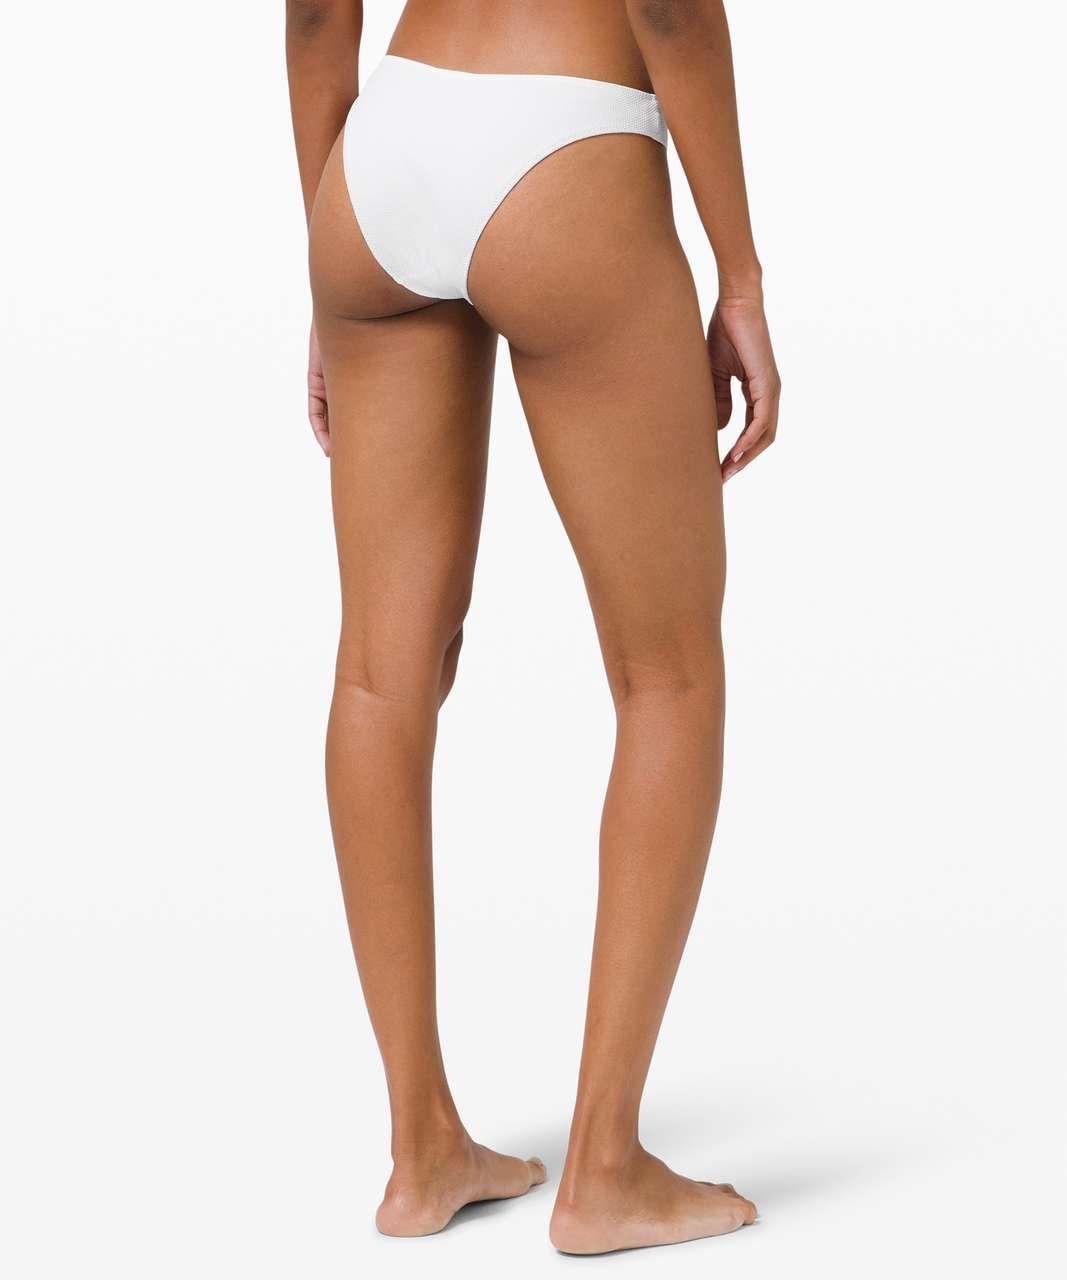 Lululemon Honeycomb Dip Swim Bottom *Mid Rise, Skimpy - White